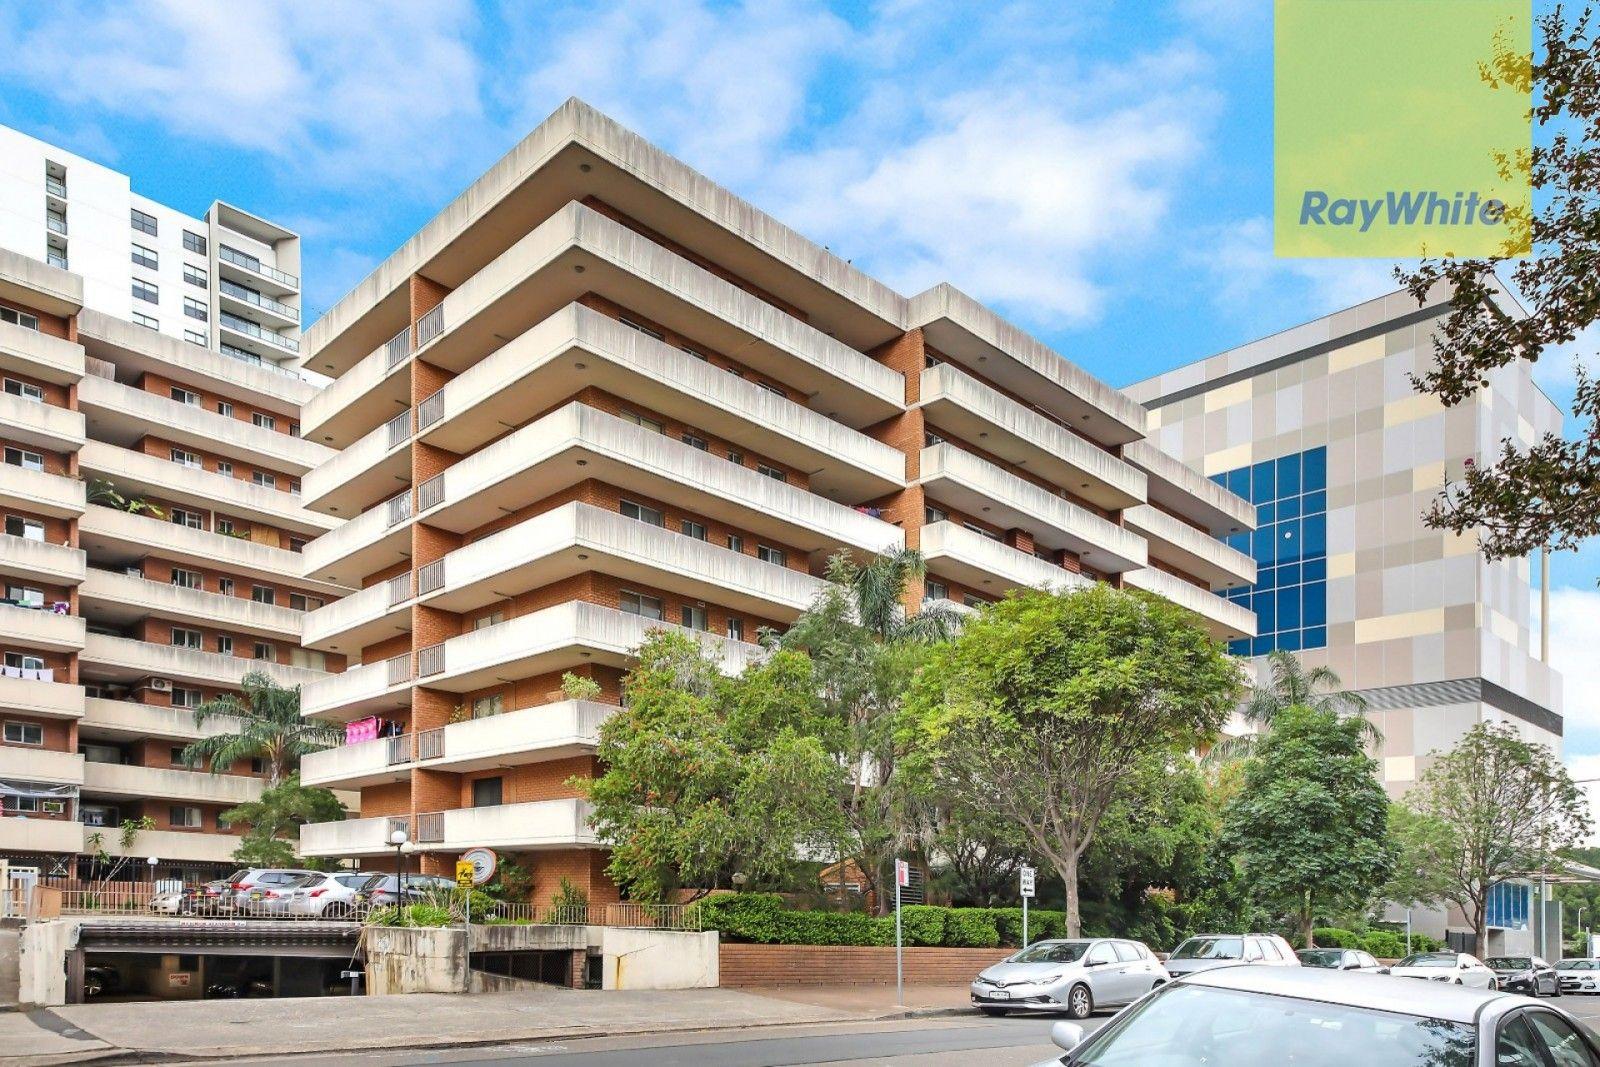 10/128 Macquarie Street, Parramatta NSW 2150, Image 0